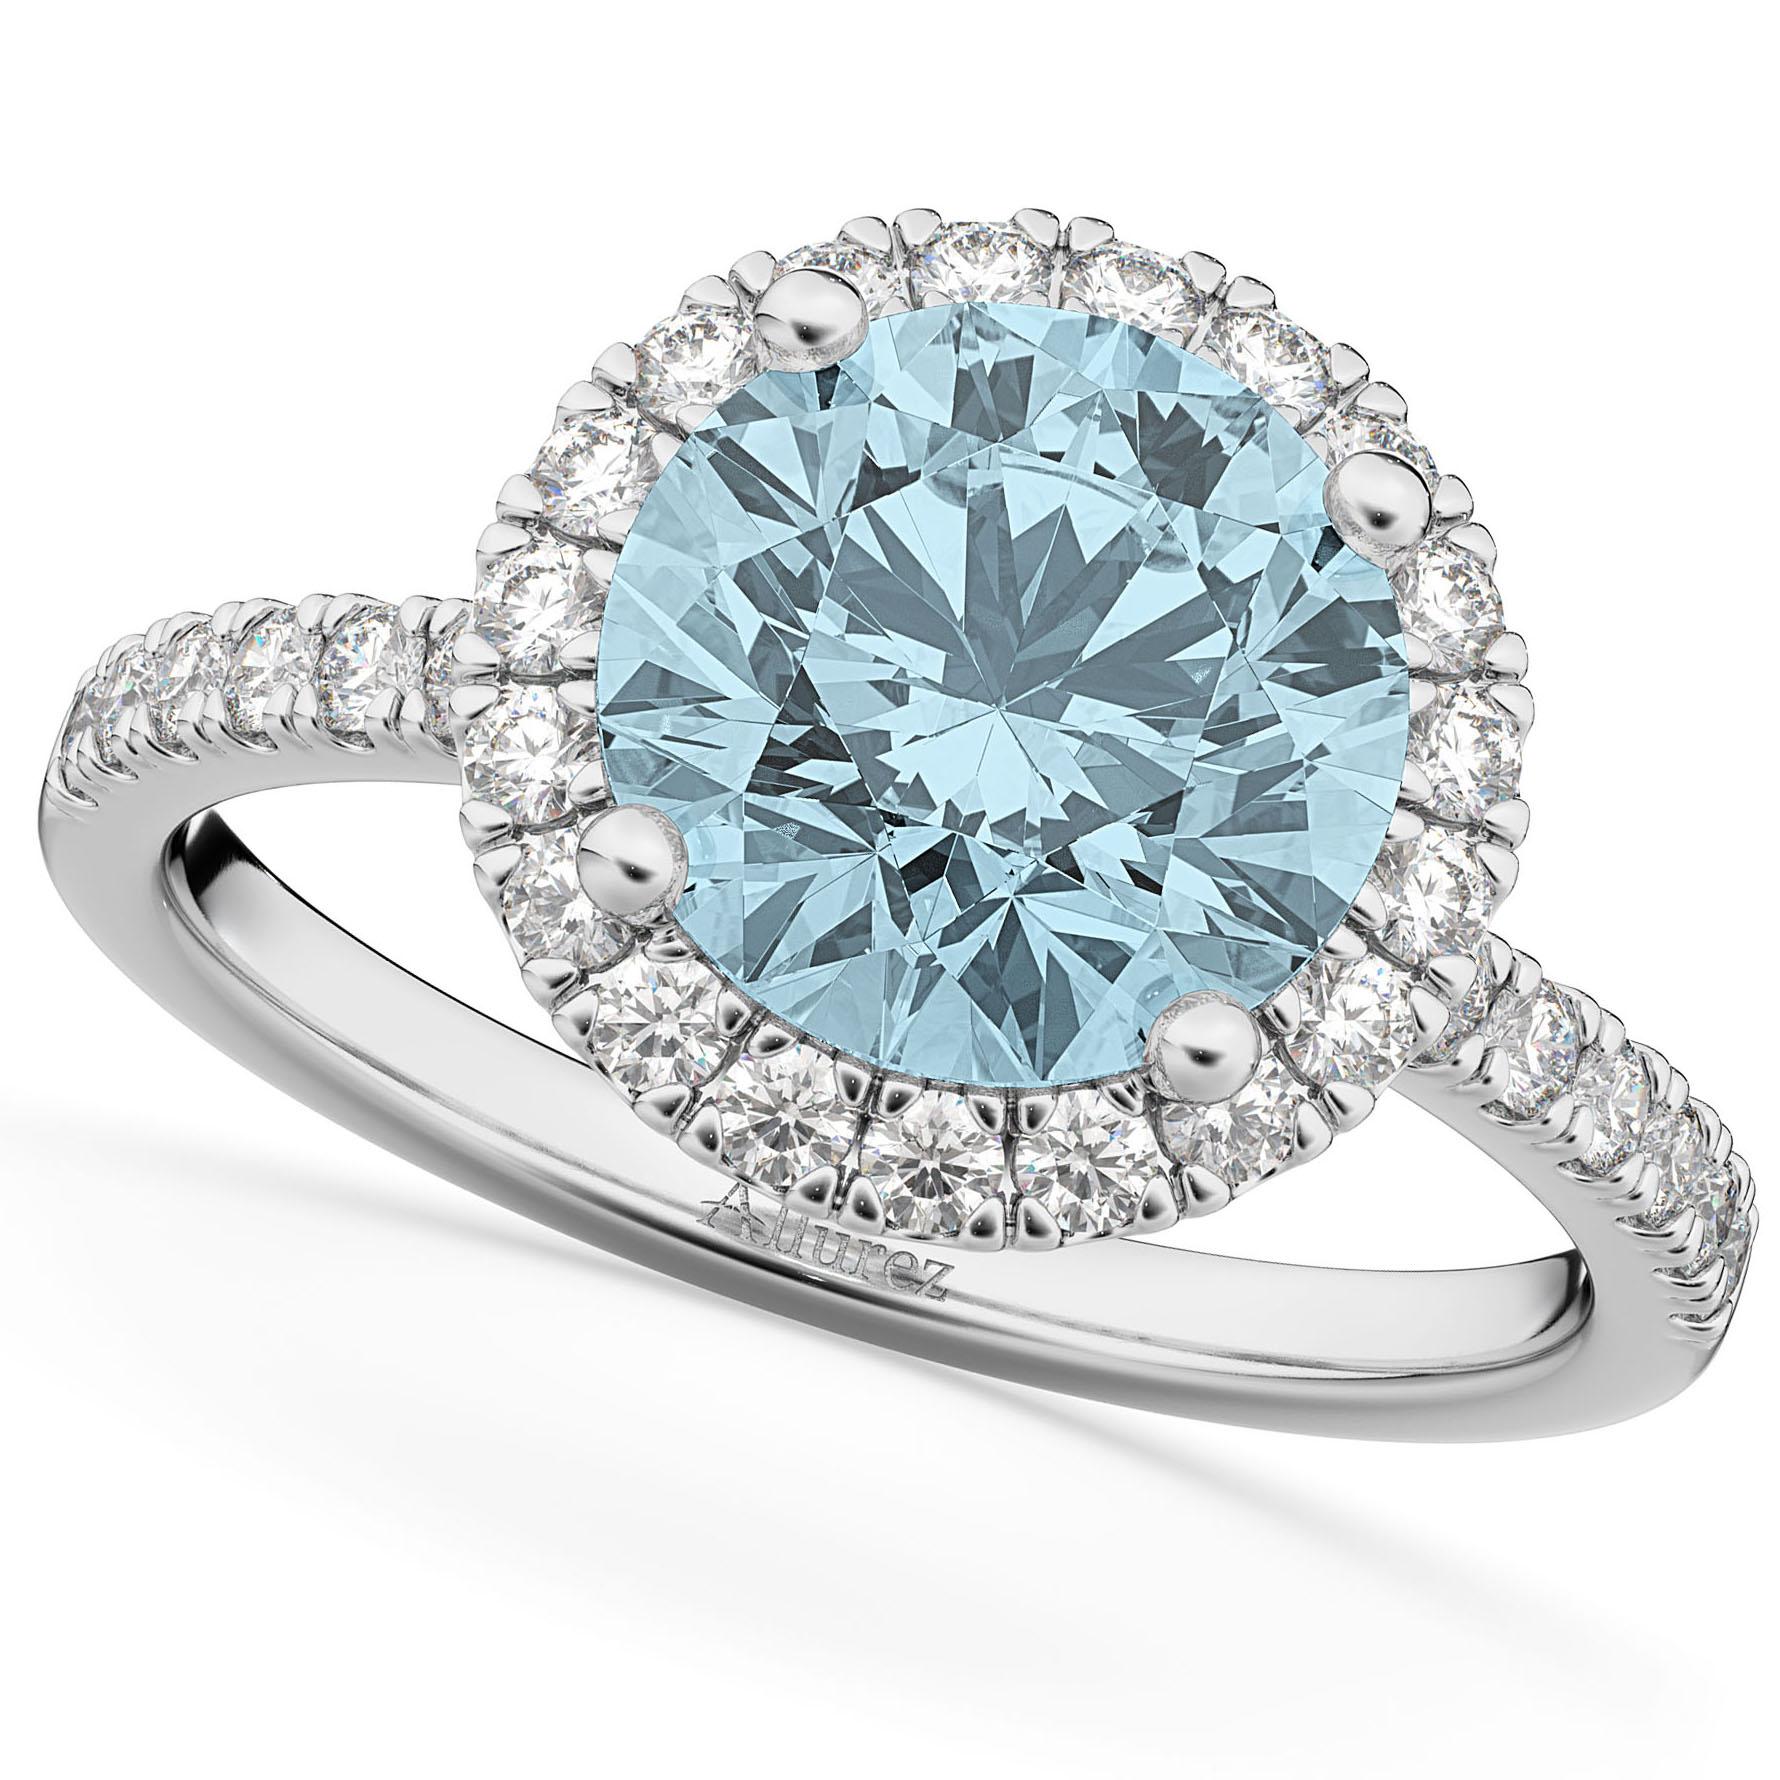 Halo Aquamarine & Diamond Engagement Ring 18K White Gold 2.70ct